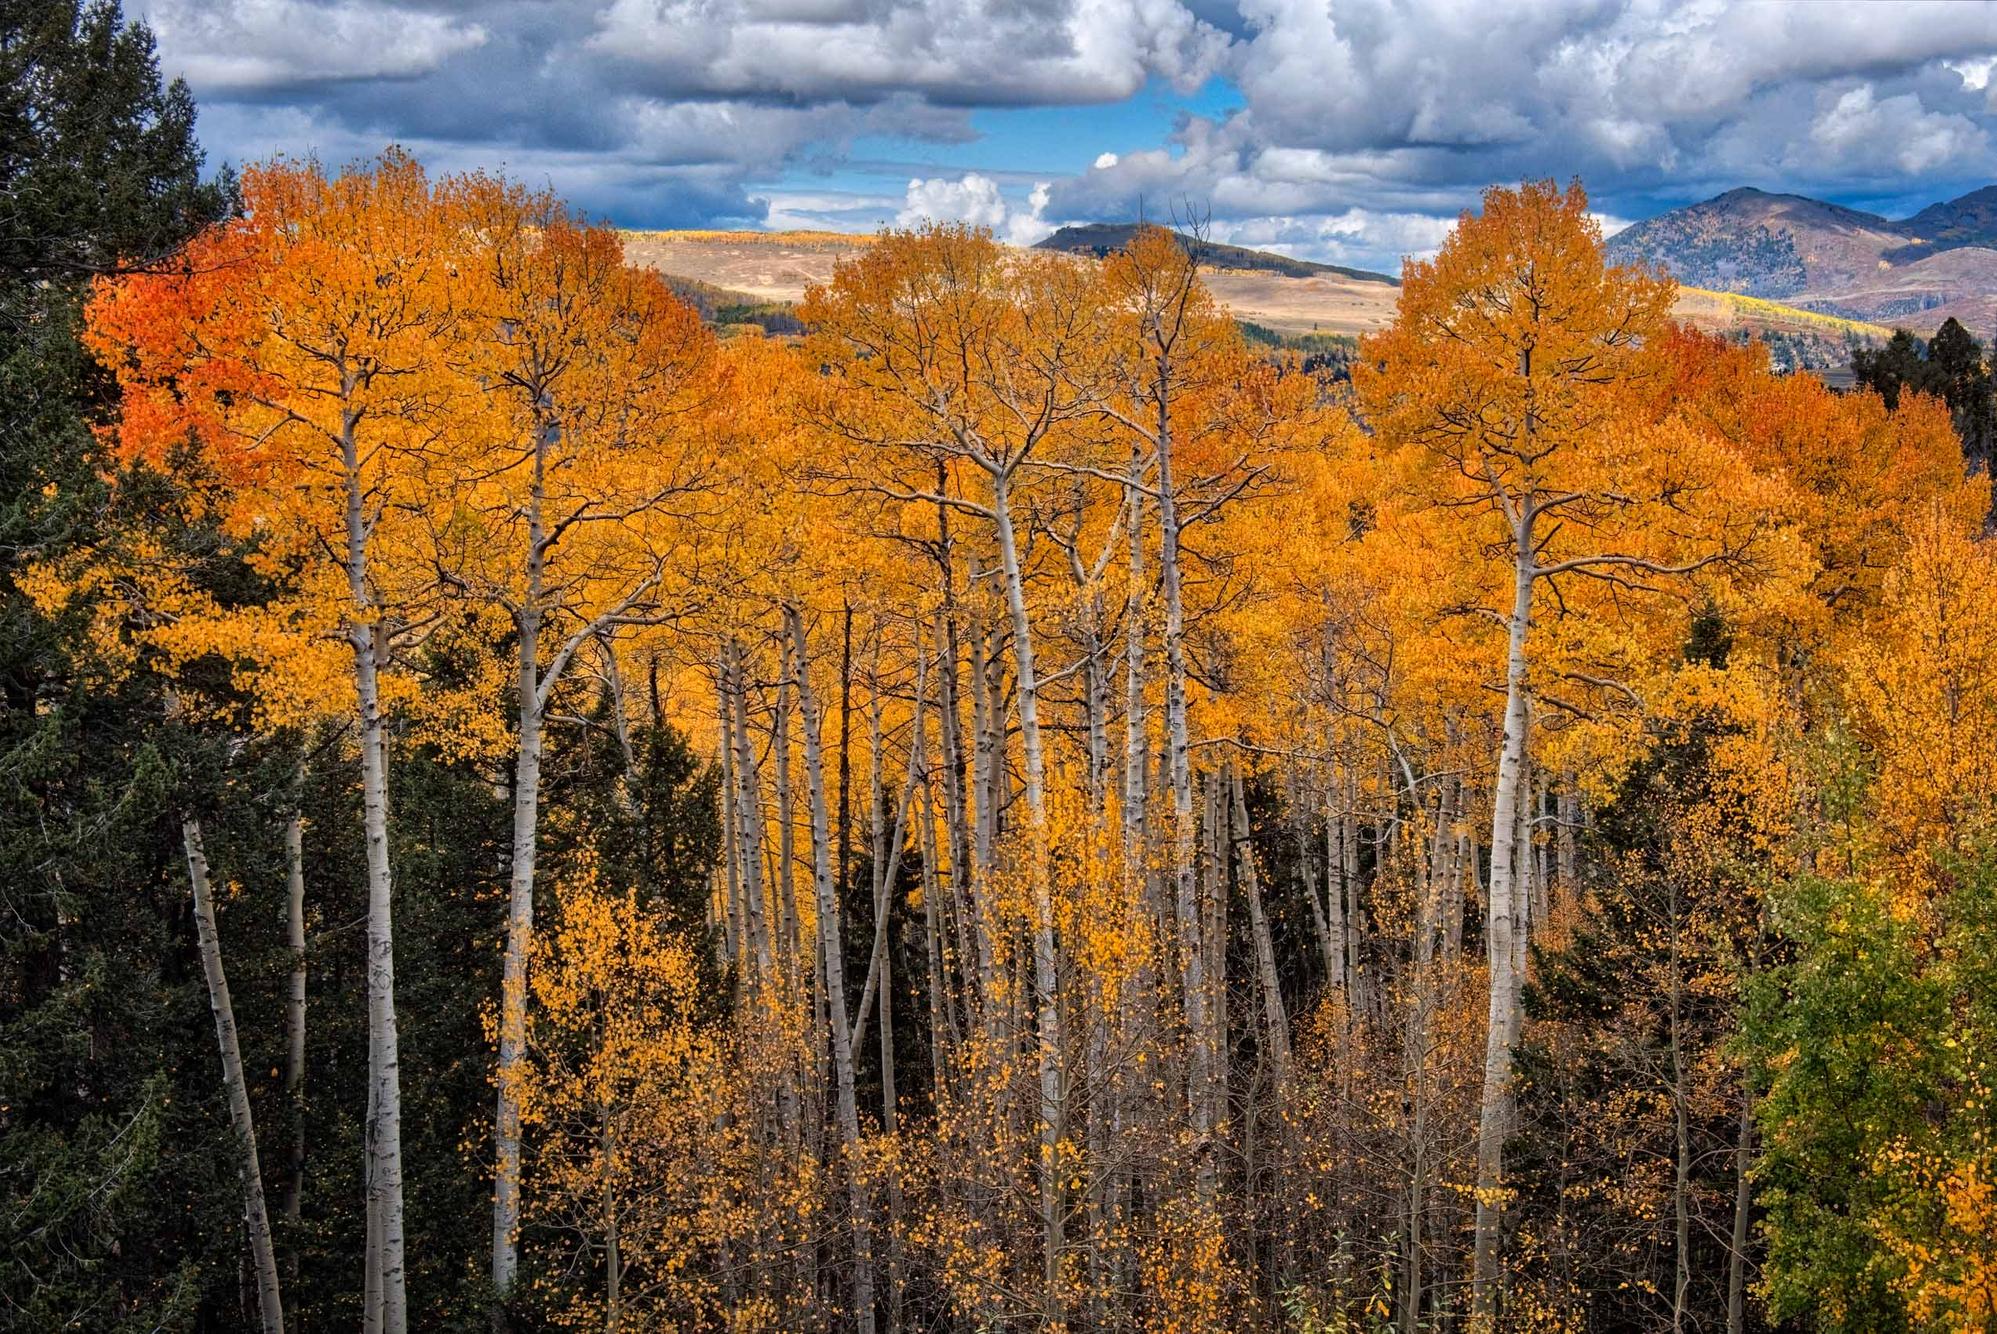 Fall Color in the San Juan Mountains of Colorado